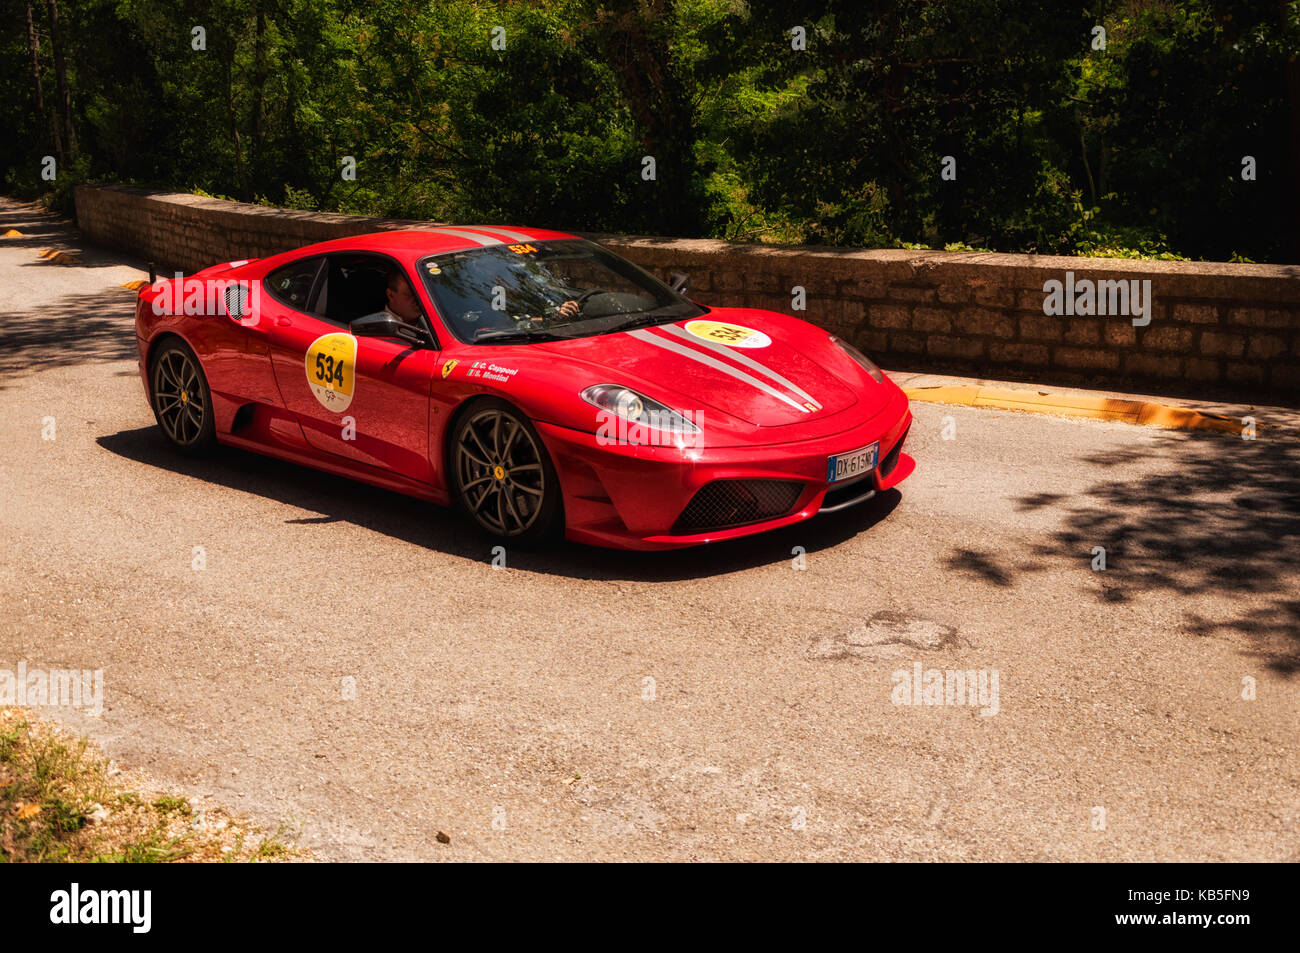 Gola Del Furlo Italy Ferrari F12 Berlinetta 2015 On An Old Racing